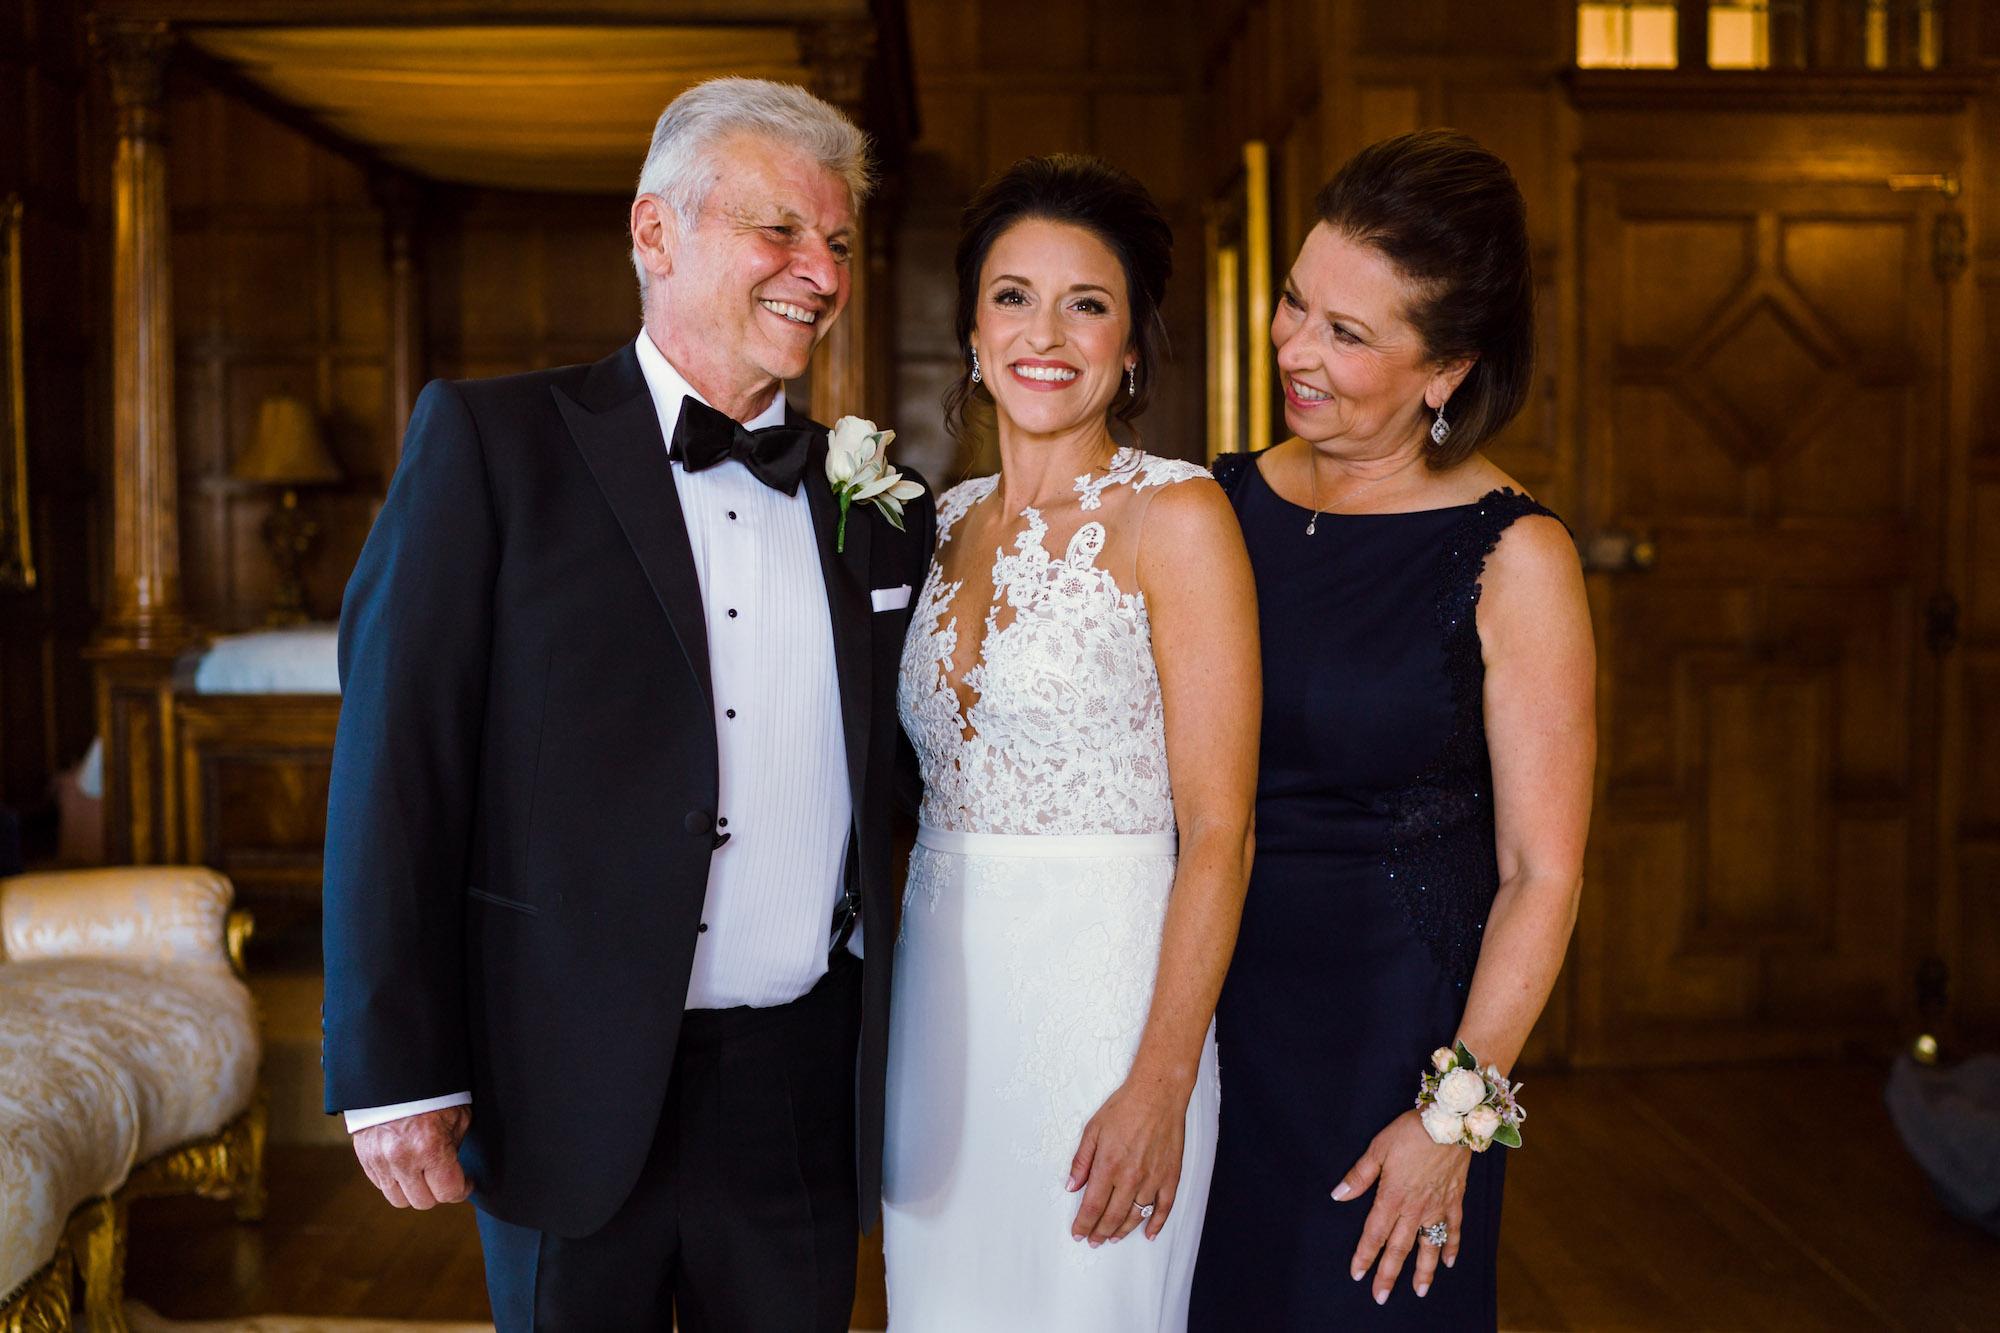 24   Hengrave Hall Wedding   Suffolk Wedding   Lamare London   Luxury Wedding Planner   Jon Mold Photography.jpg